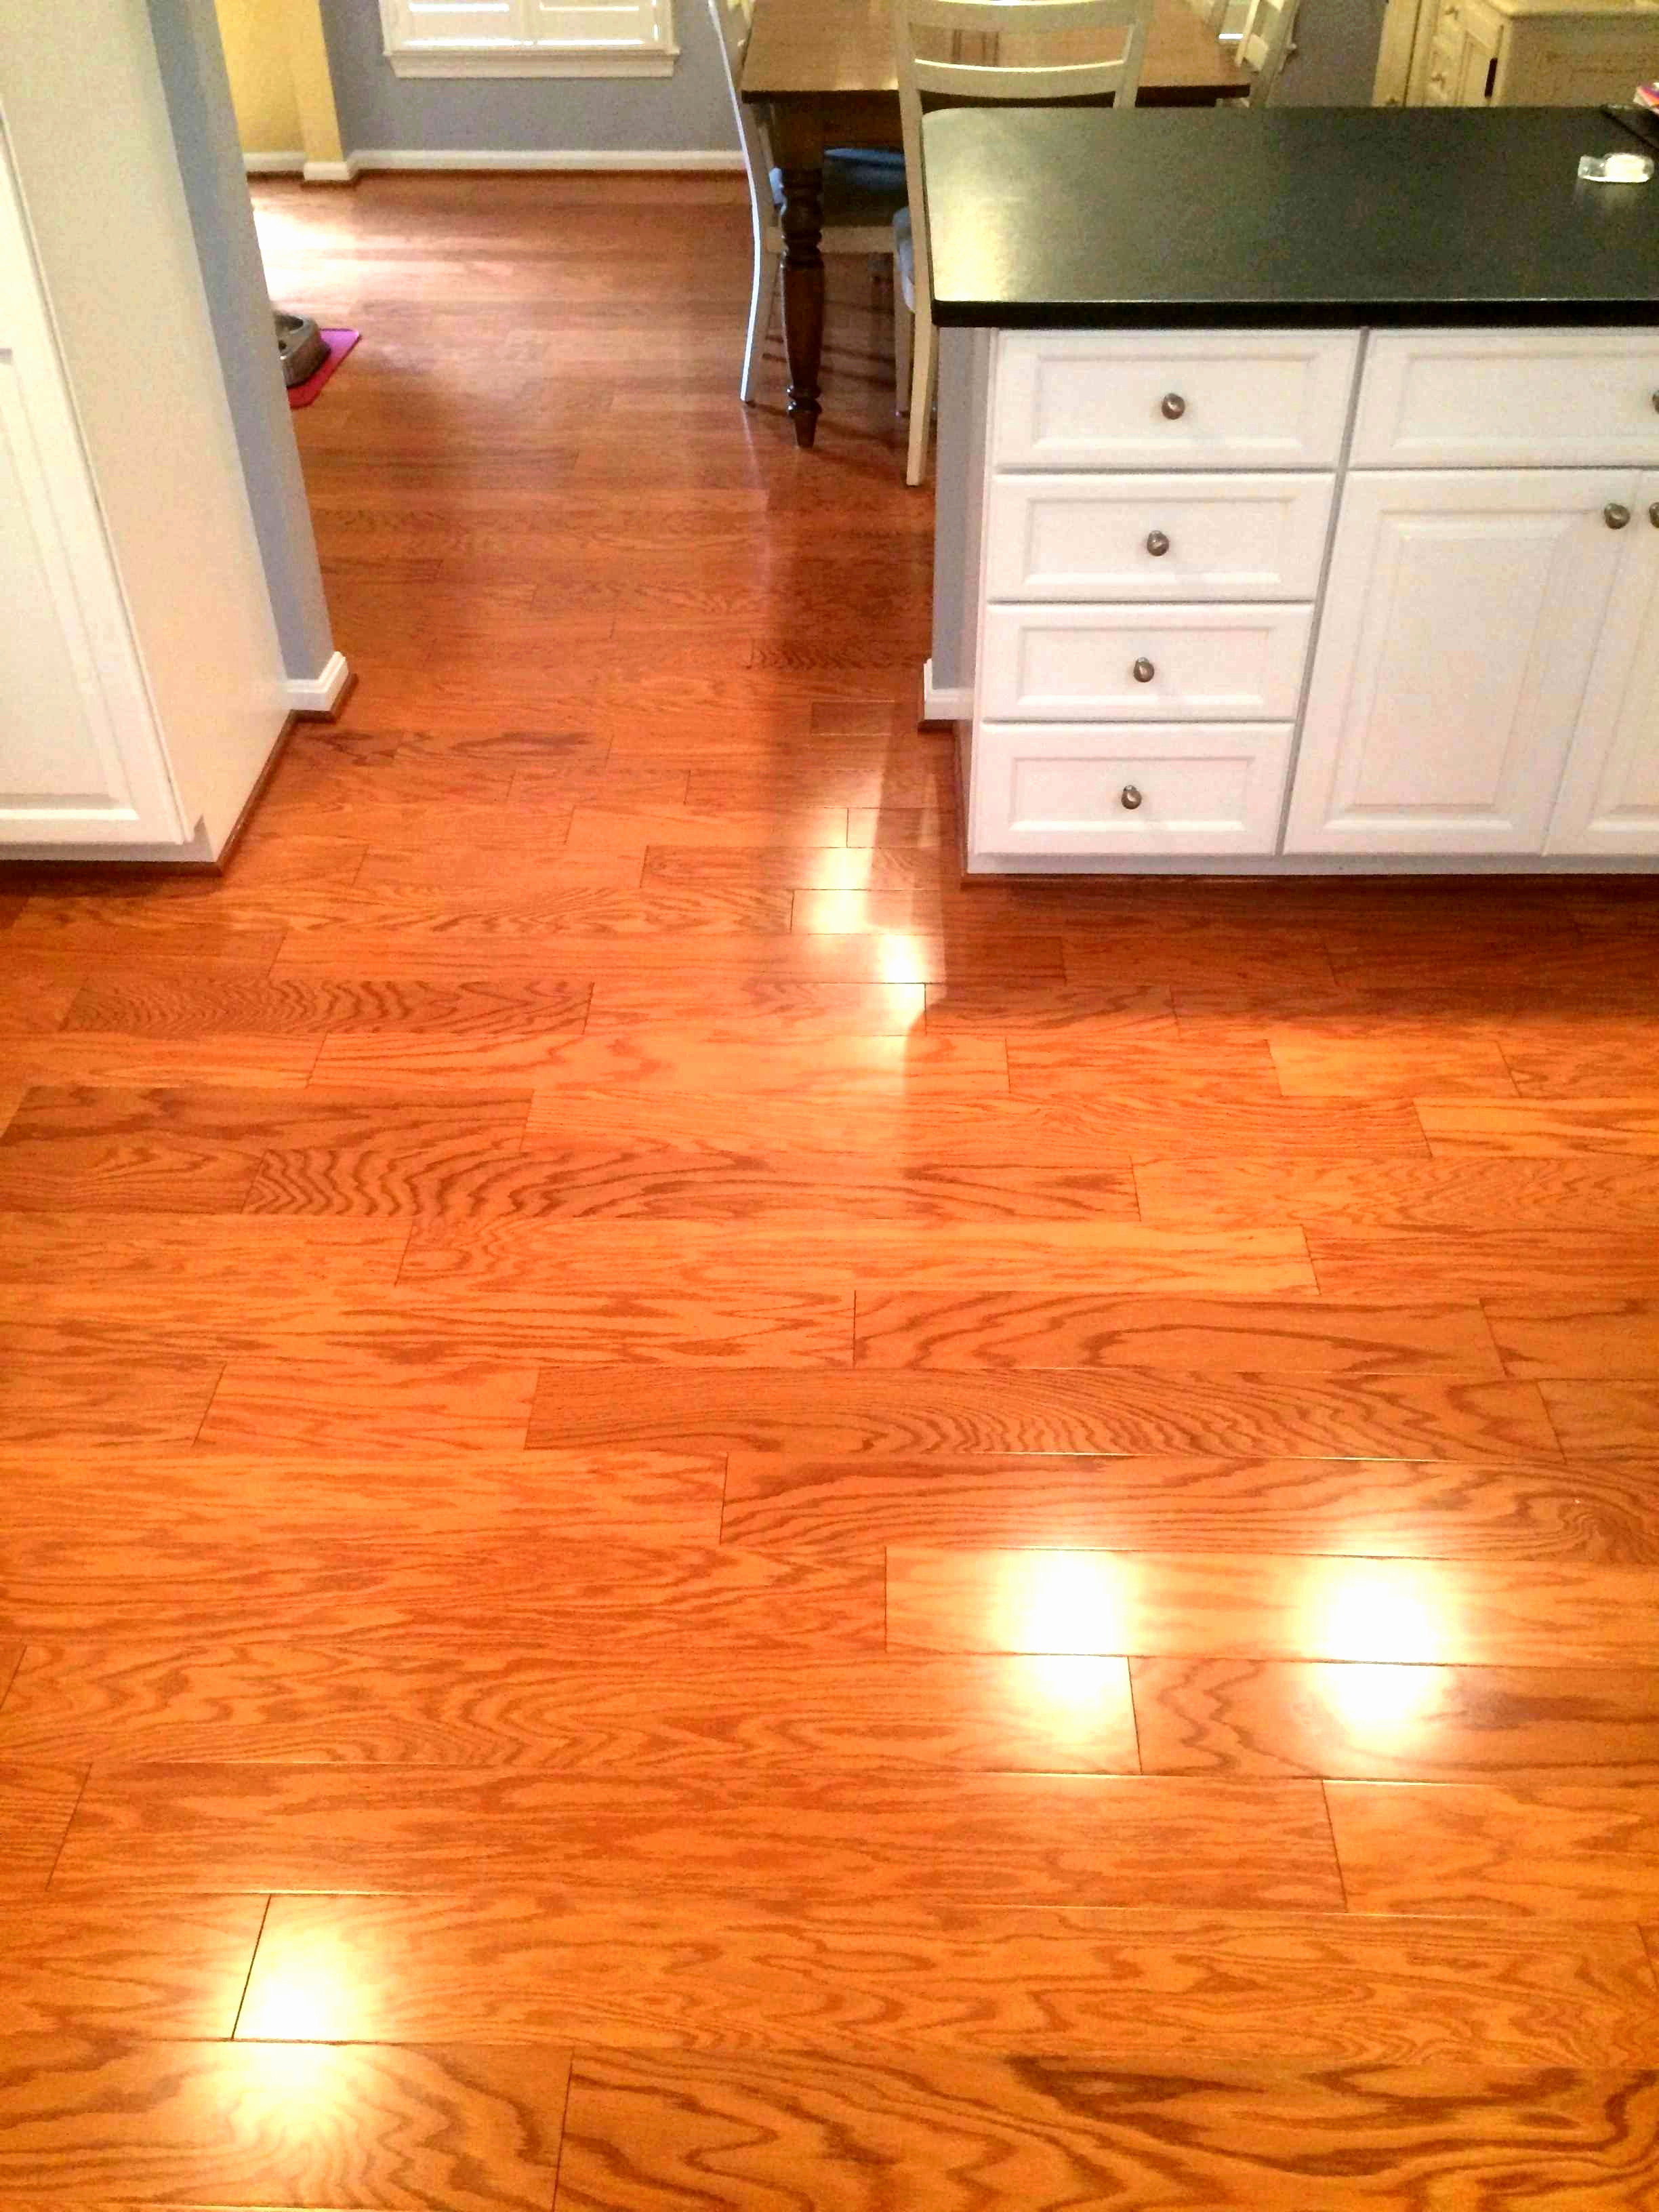 hardwood floor cleaner mop of hardwood floor maintenance floor plan ideas throughout hardwood floor maintenance 50 fresh what is the best cleaner for hardwood floors pics 50